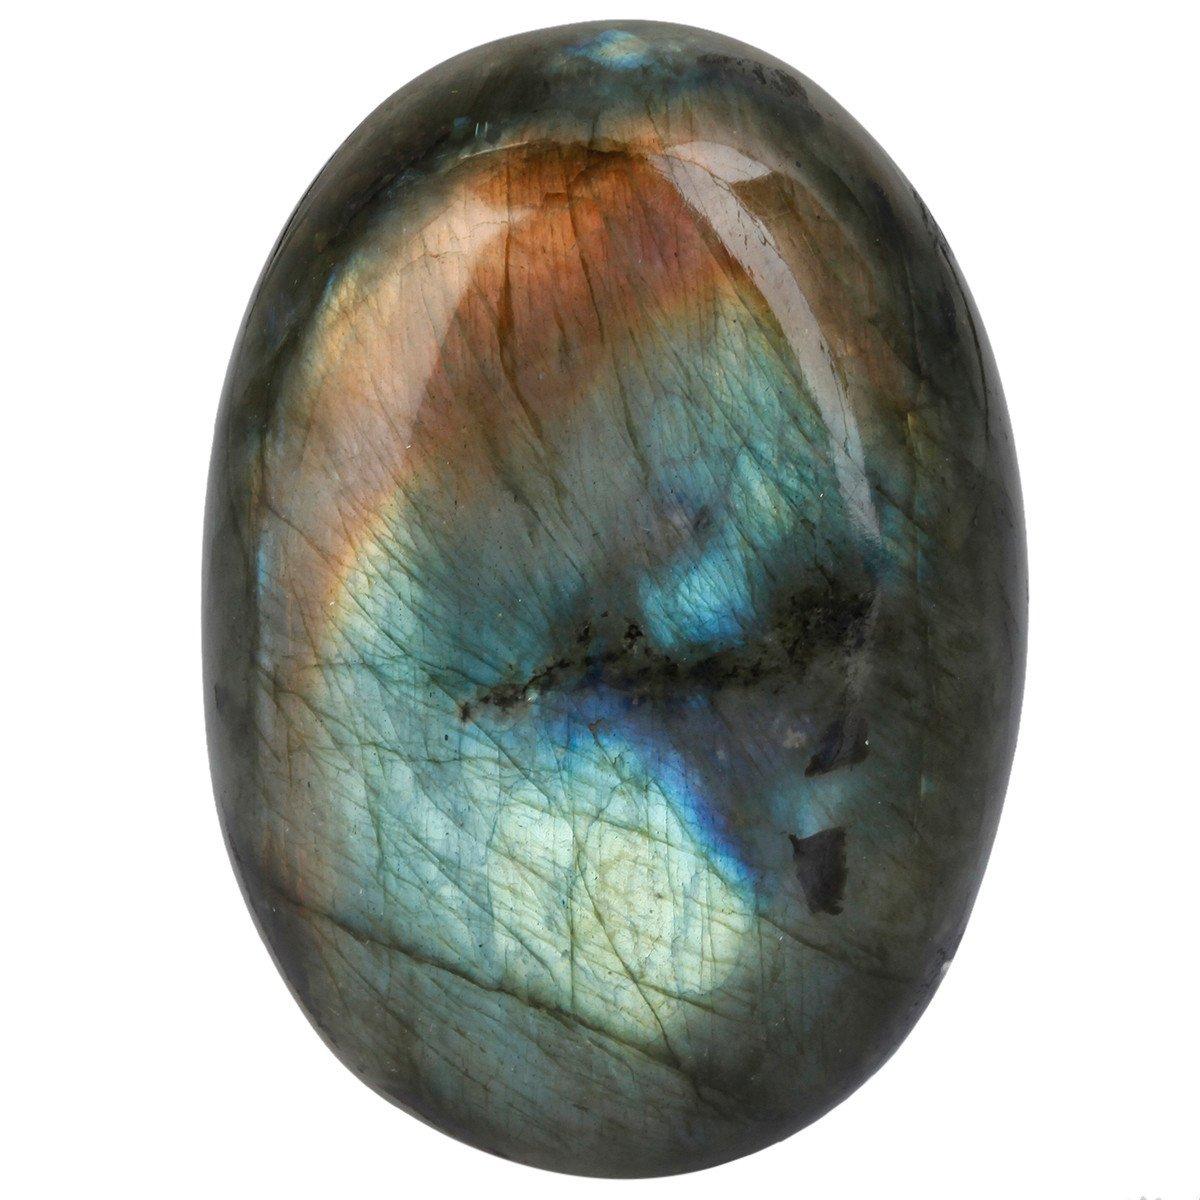 mookaitedecor Natural Labradorite Palm Stone Crystal Healing Gemstone Worry Therapy Irregular Shape by mookaitedecor